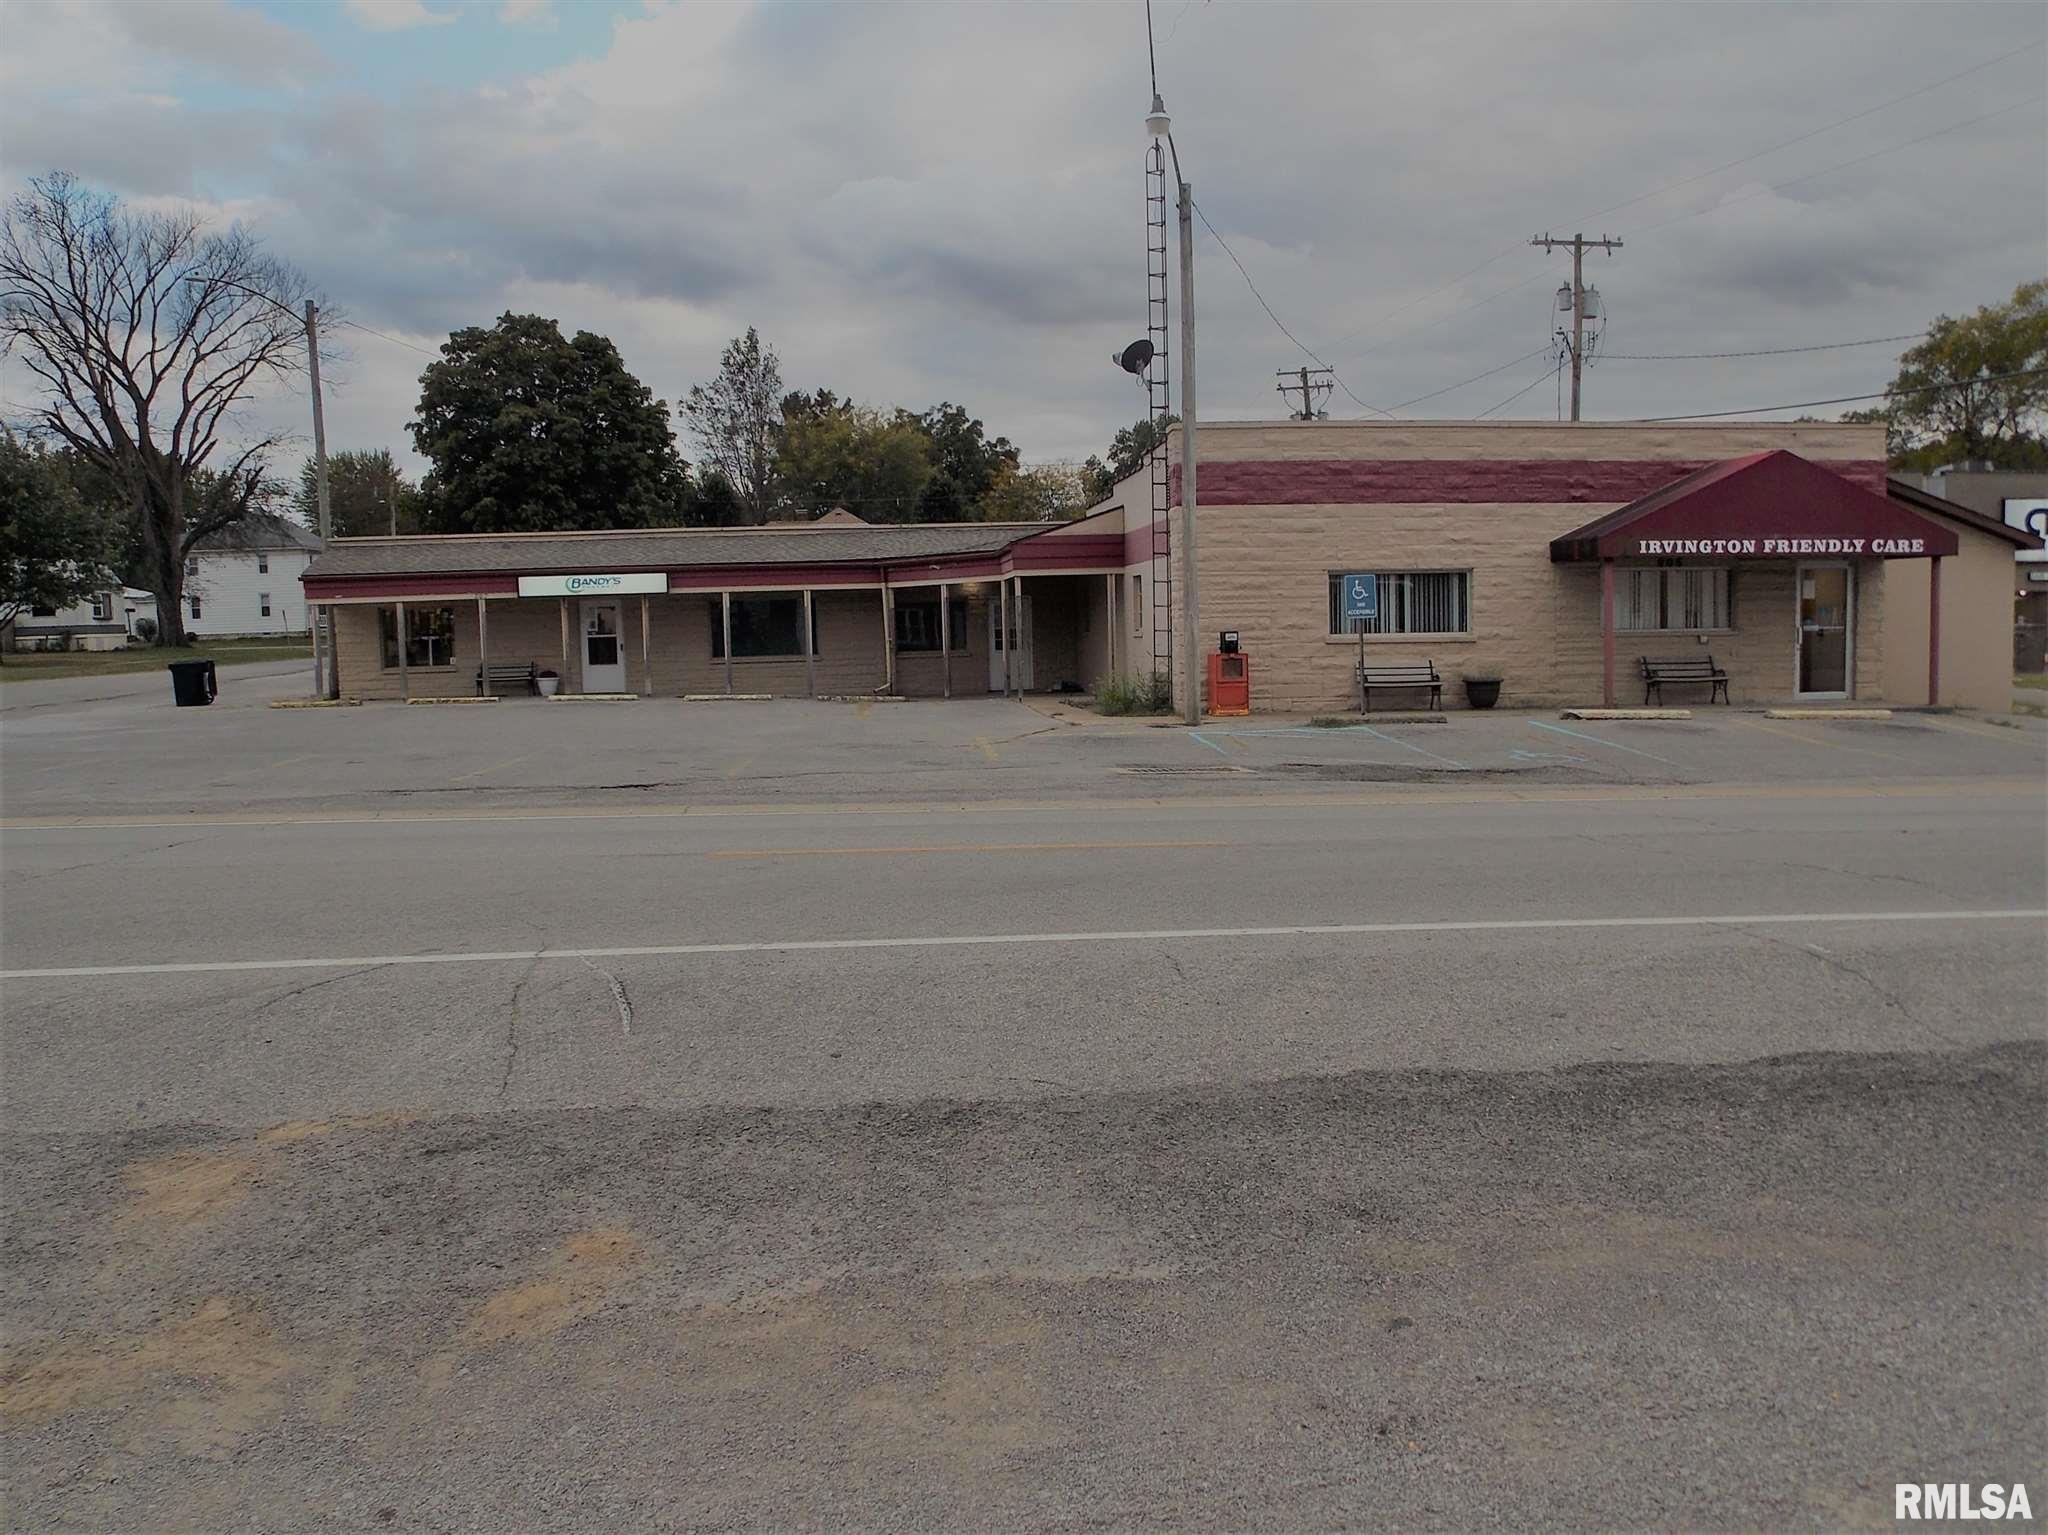 205 E Huron Property Photo - Irvington, IL real estate listing